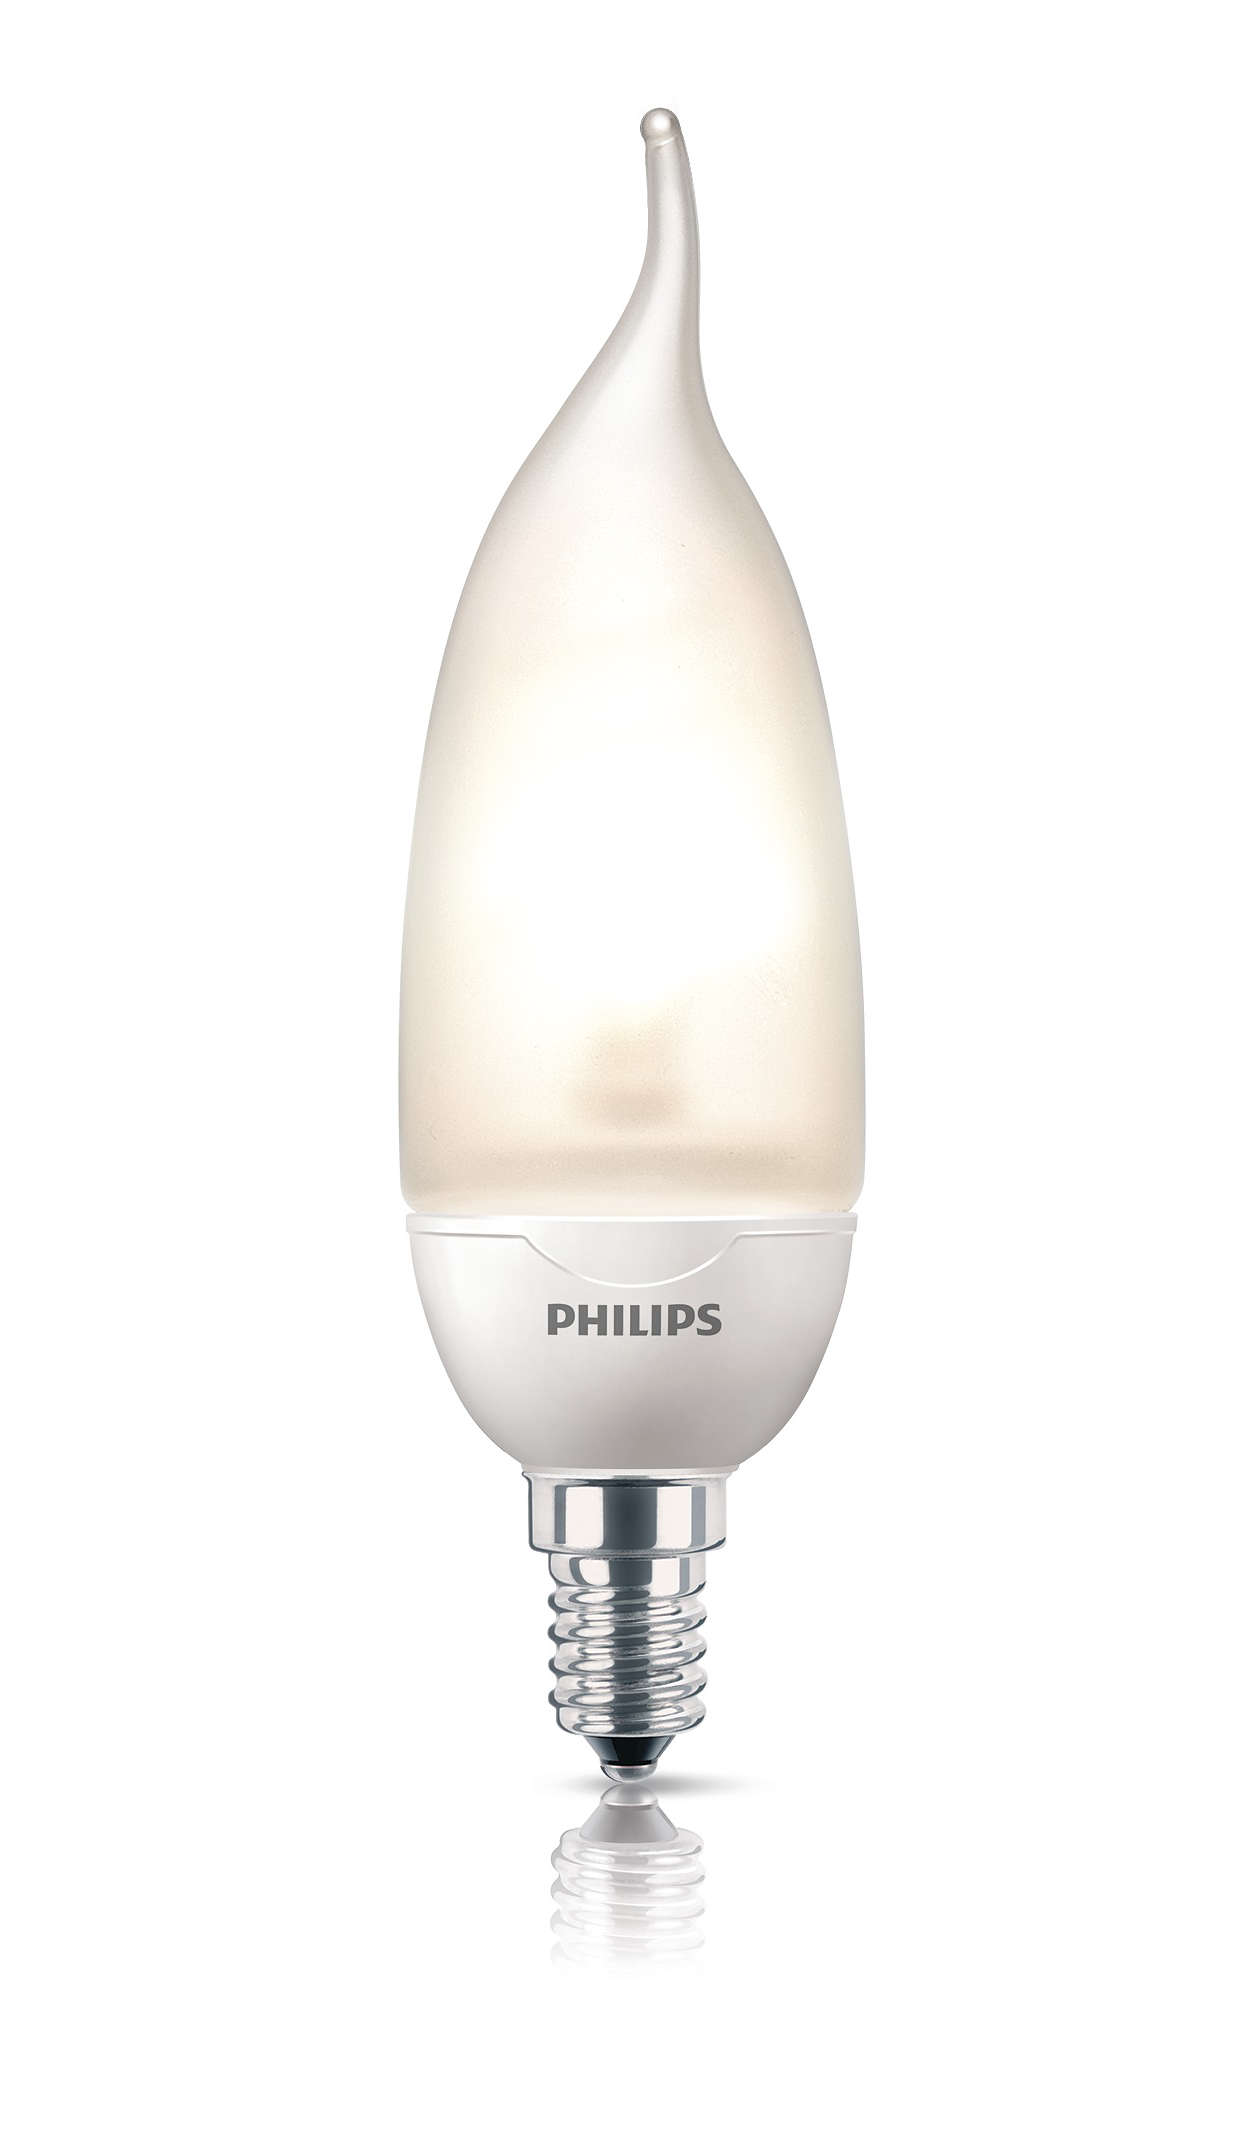 Dekorative Kerzenlampe mit Schwanenhals